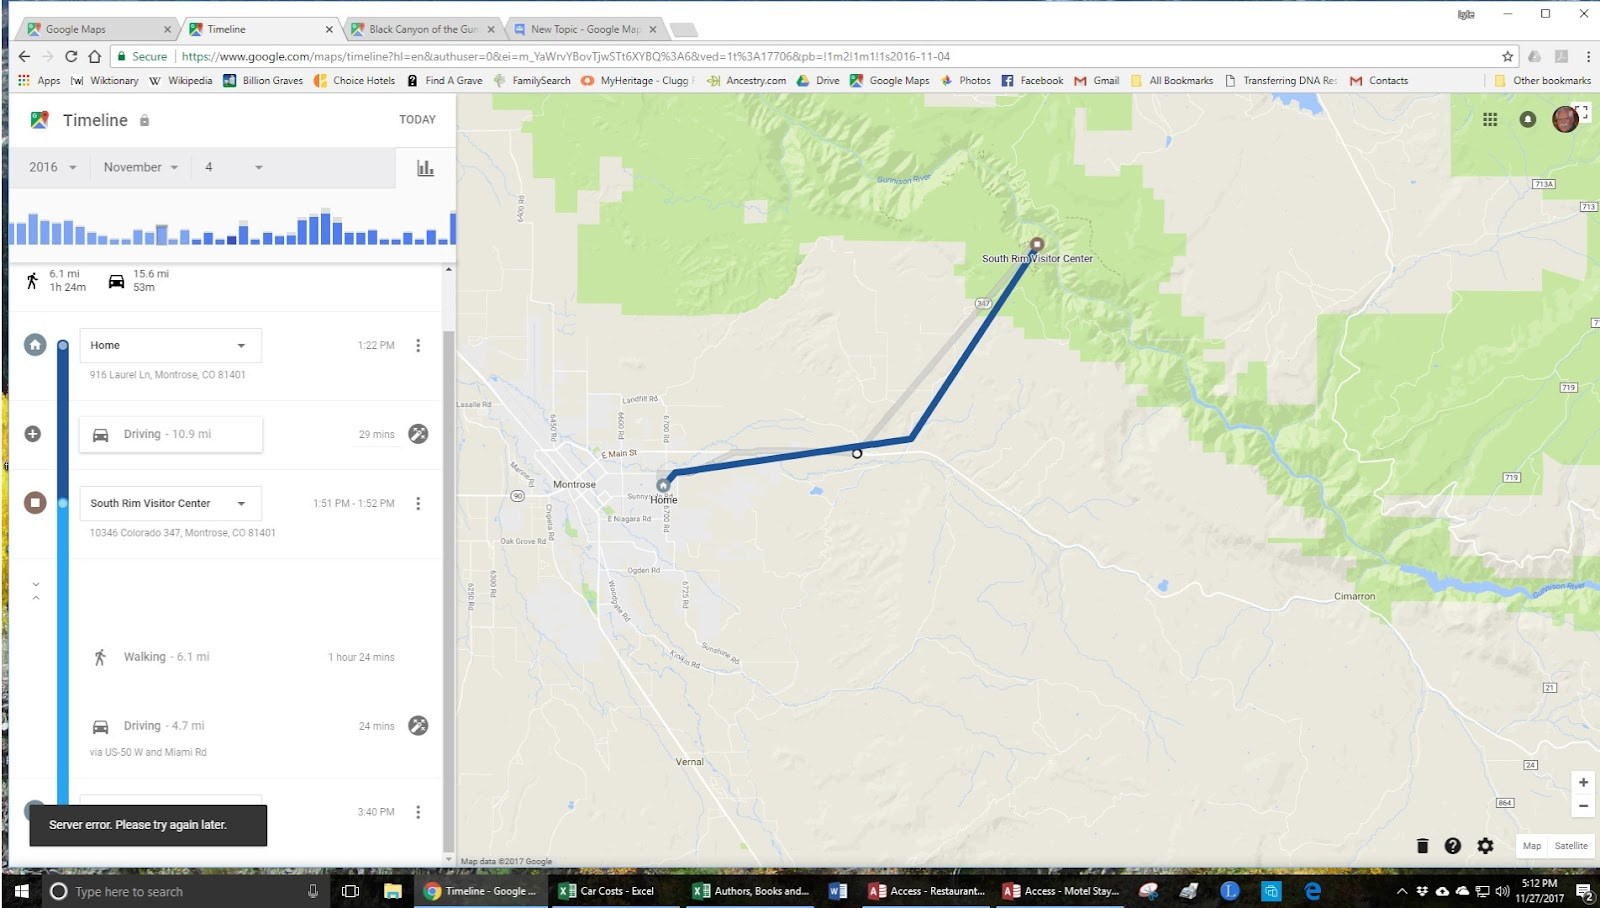 Server error  Please try again later  - Google Maps Help